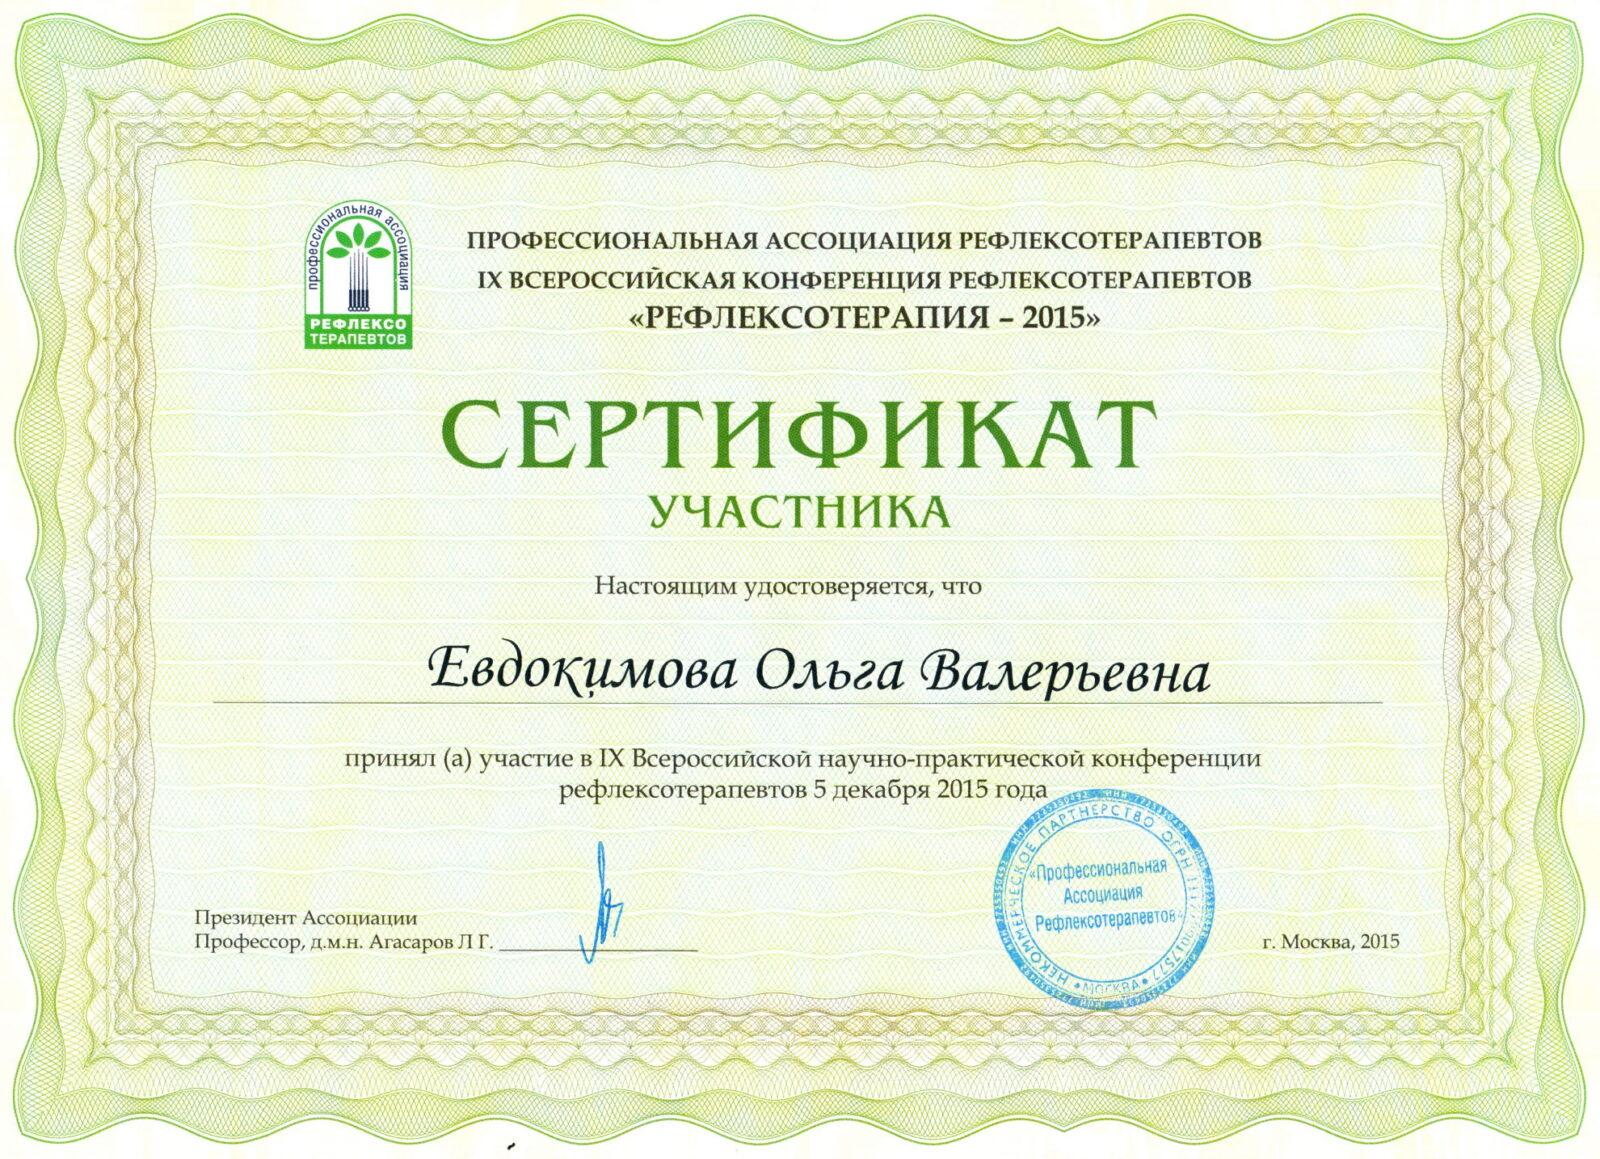 2015.12.05 Сертификат